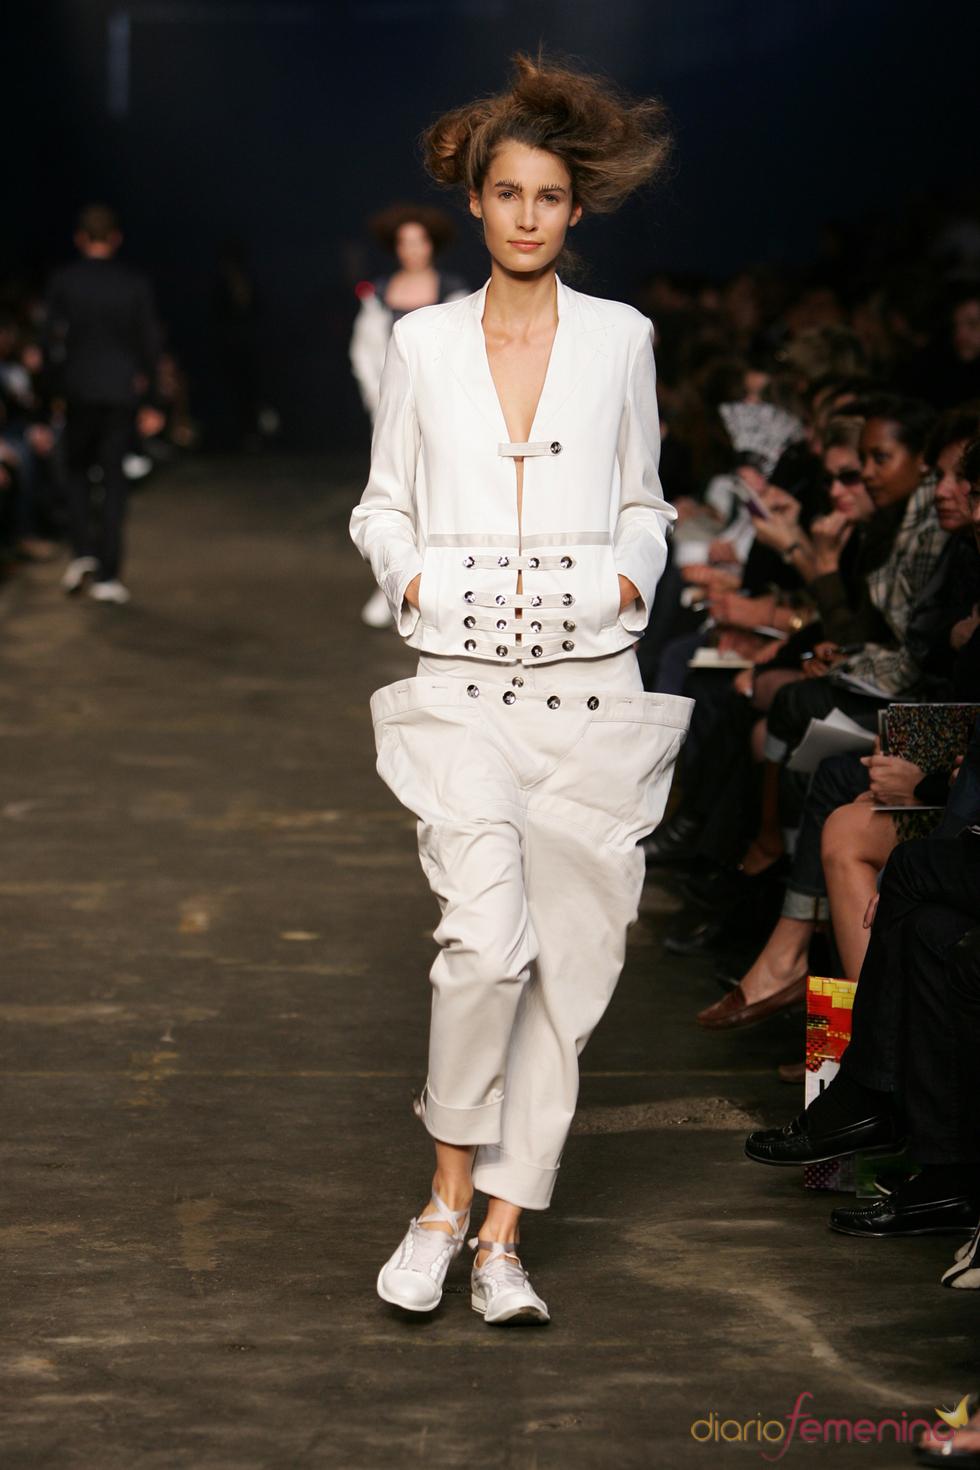 Pantalón y chaqueta crudos de Marithé François Girbaud